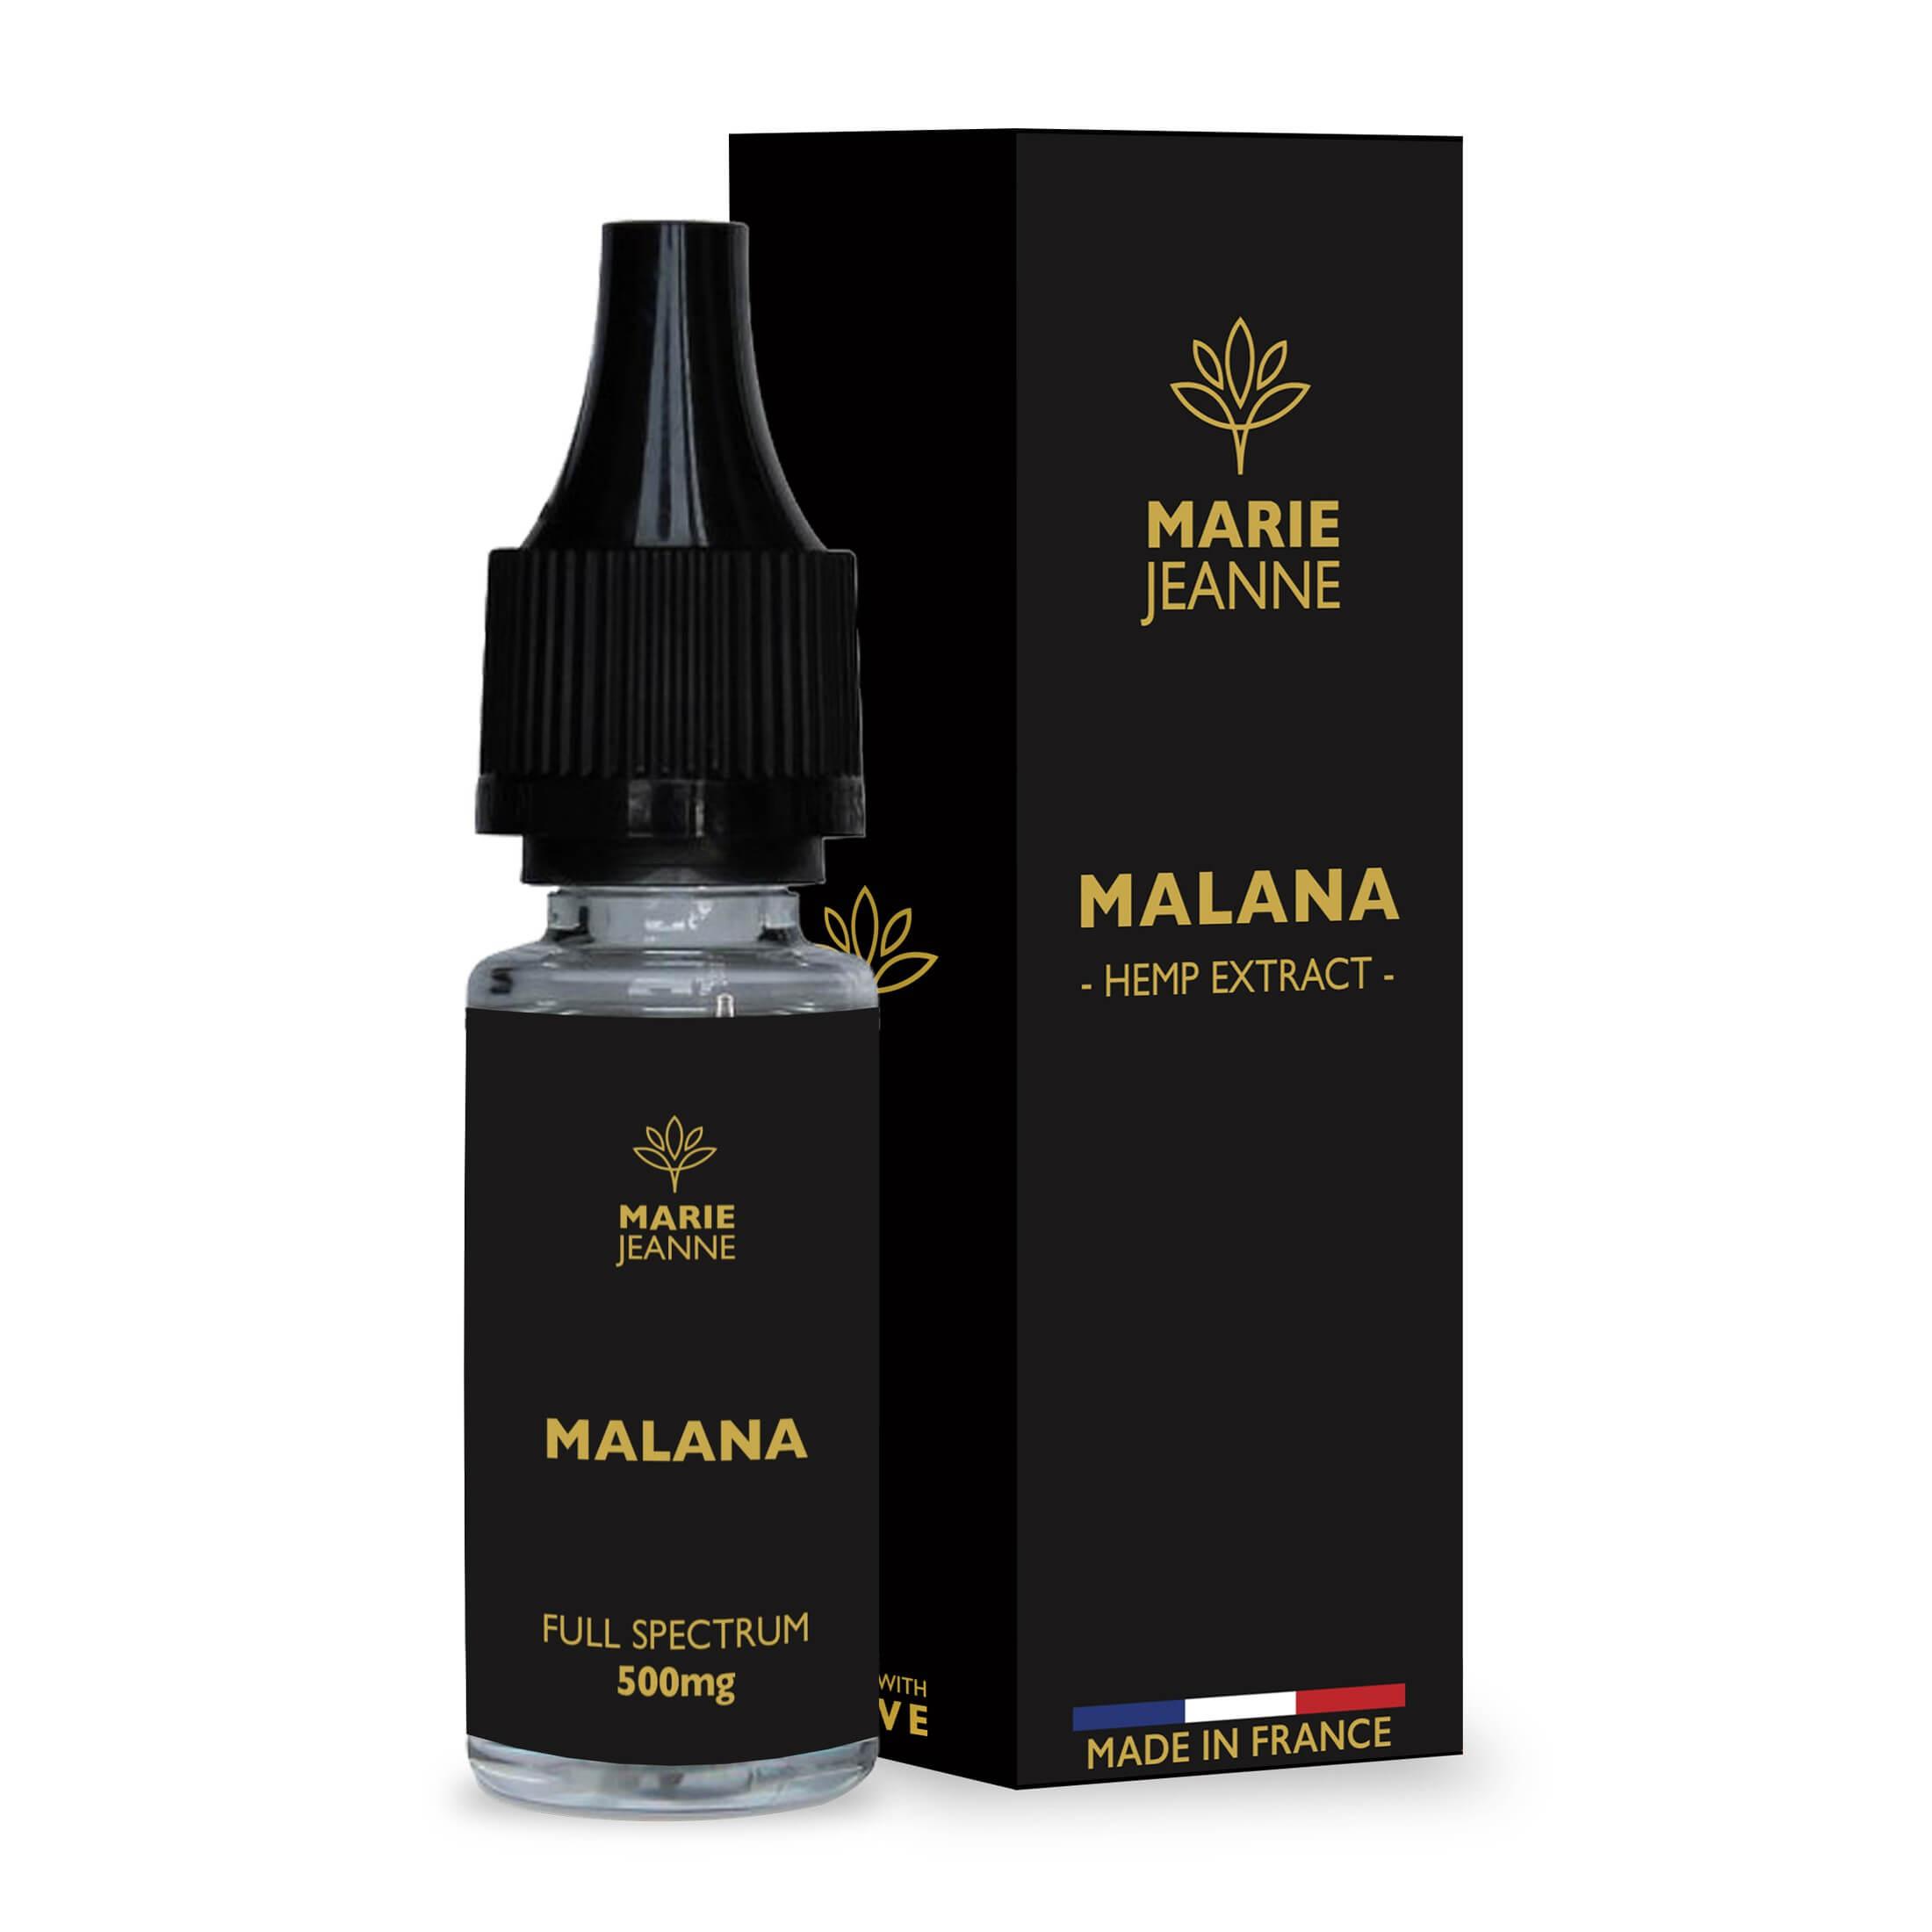 Malana Full Spectrum CBD Marie Jeanne